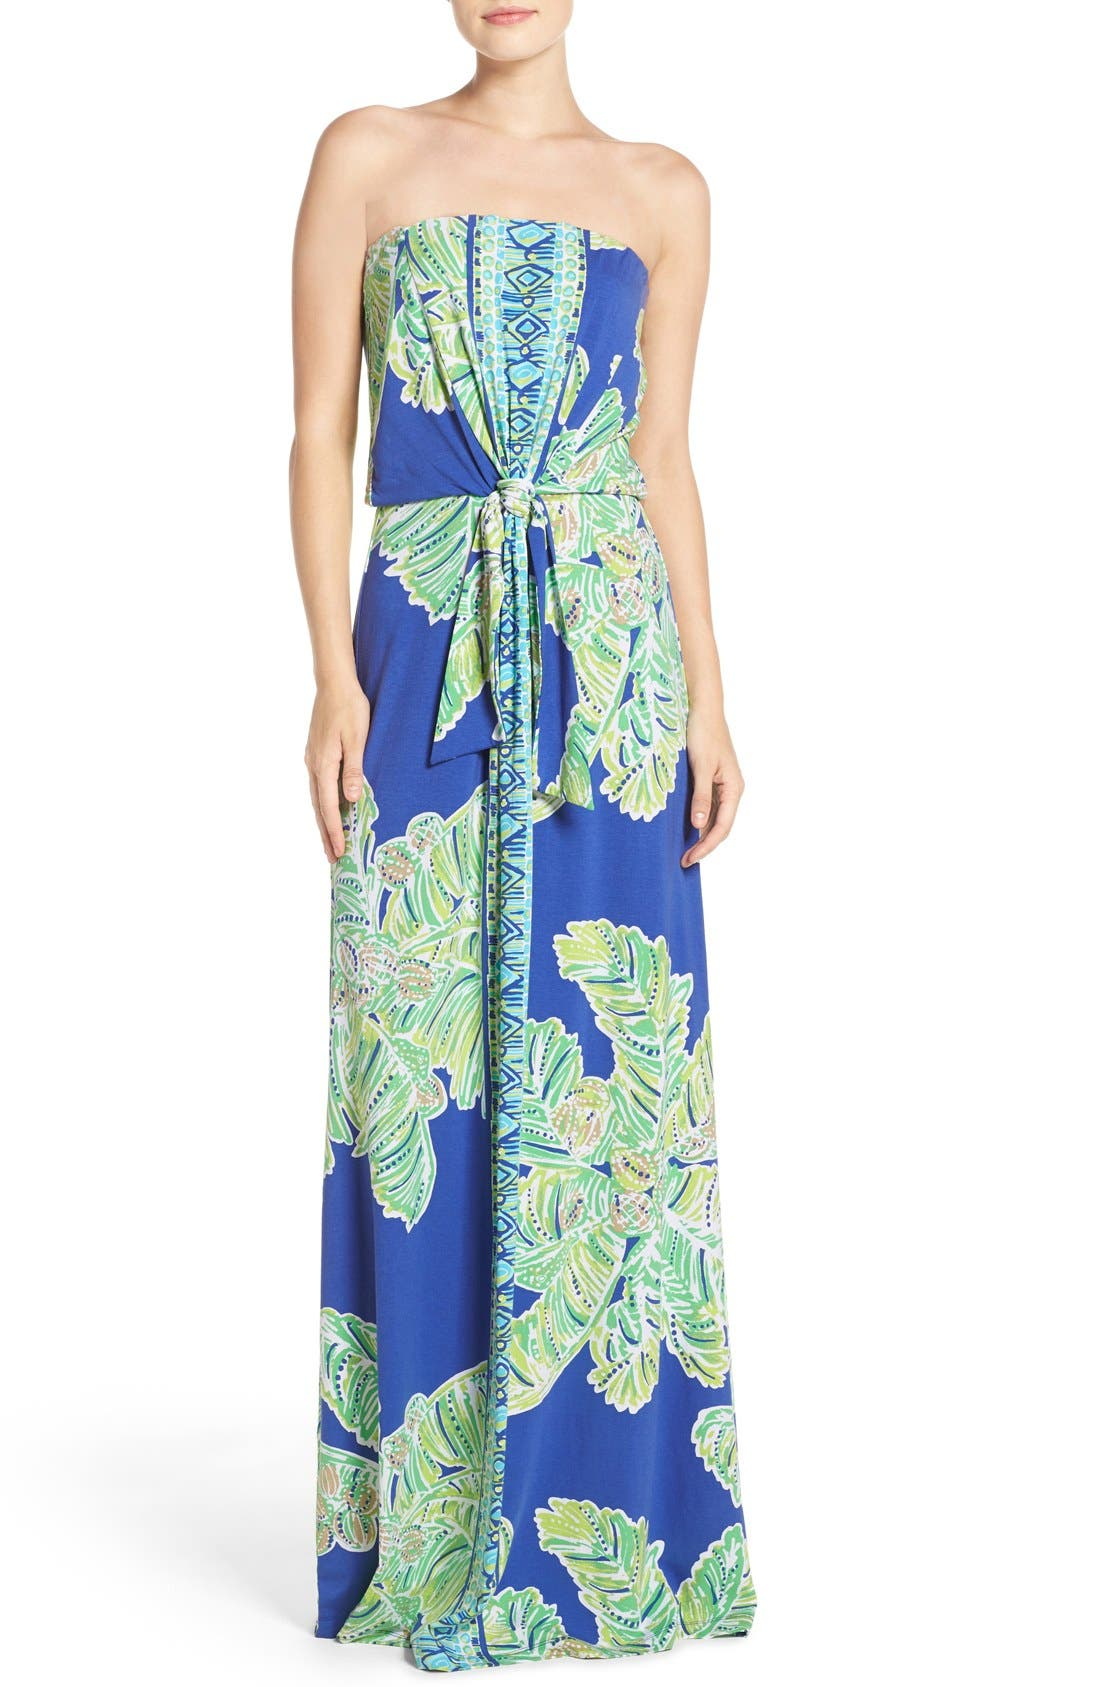 Main Image - Lilly Pulitzer® 'Rosalina' Strapless Maxi Dress